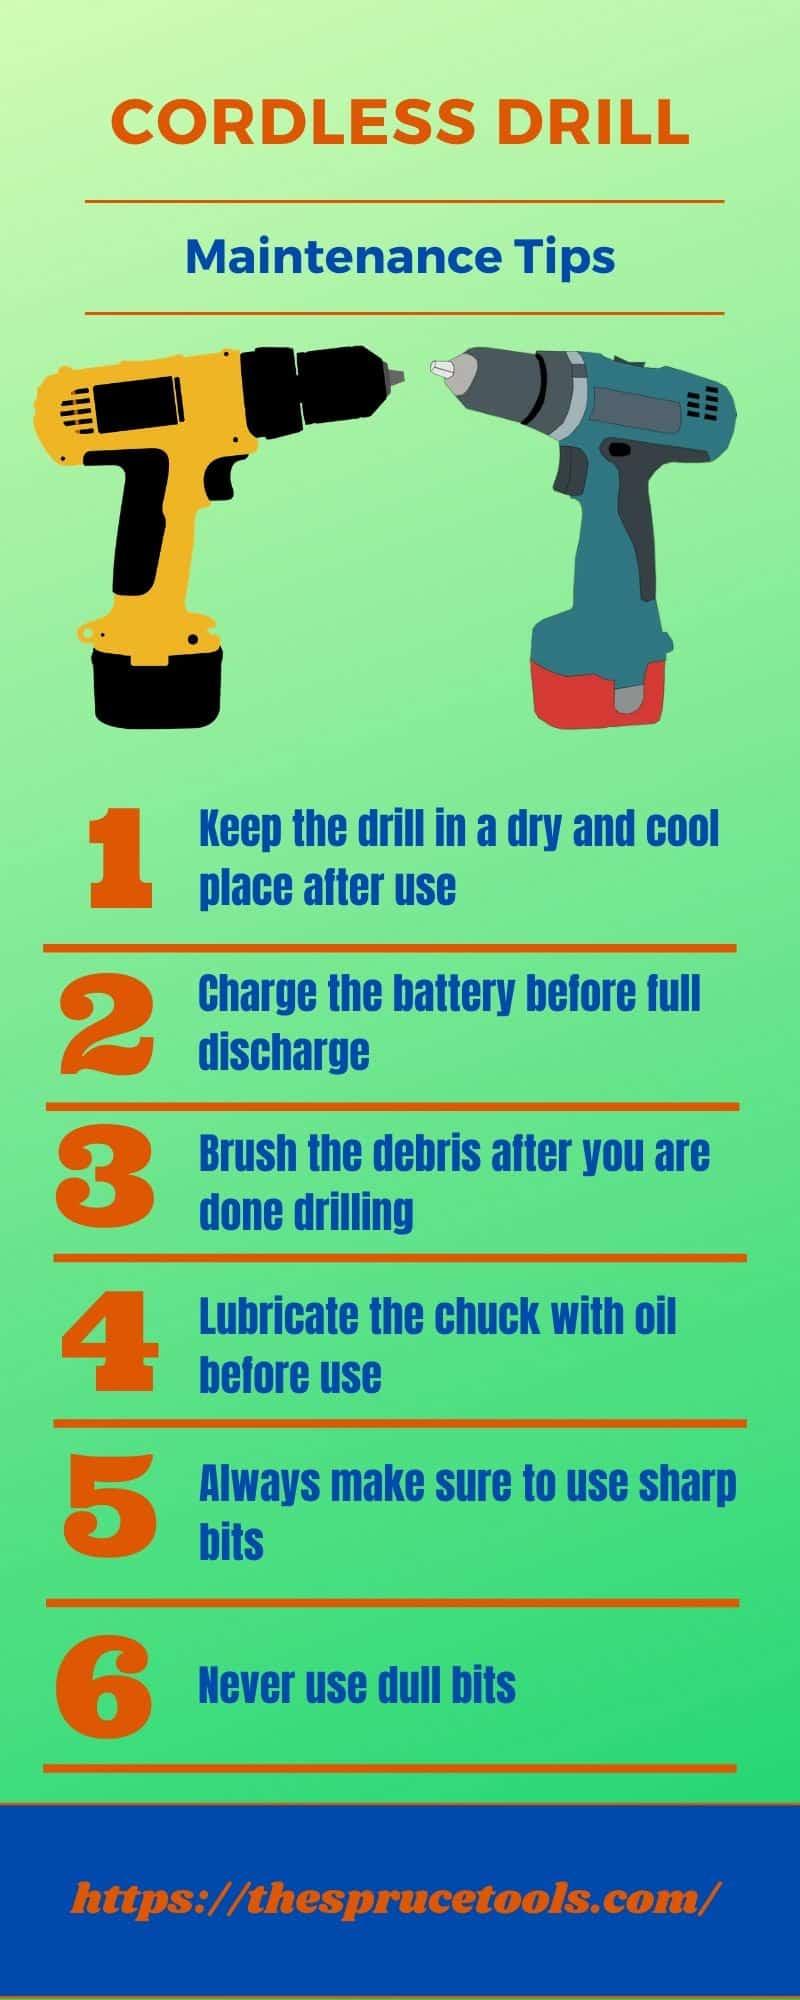 Cordless Drill Maintenance Tips